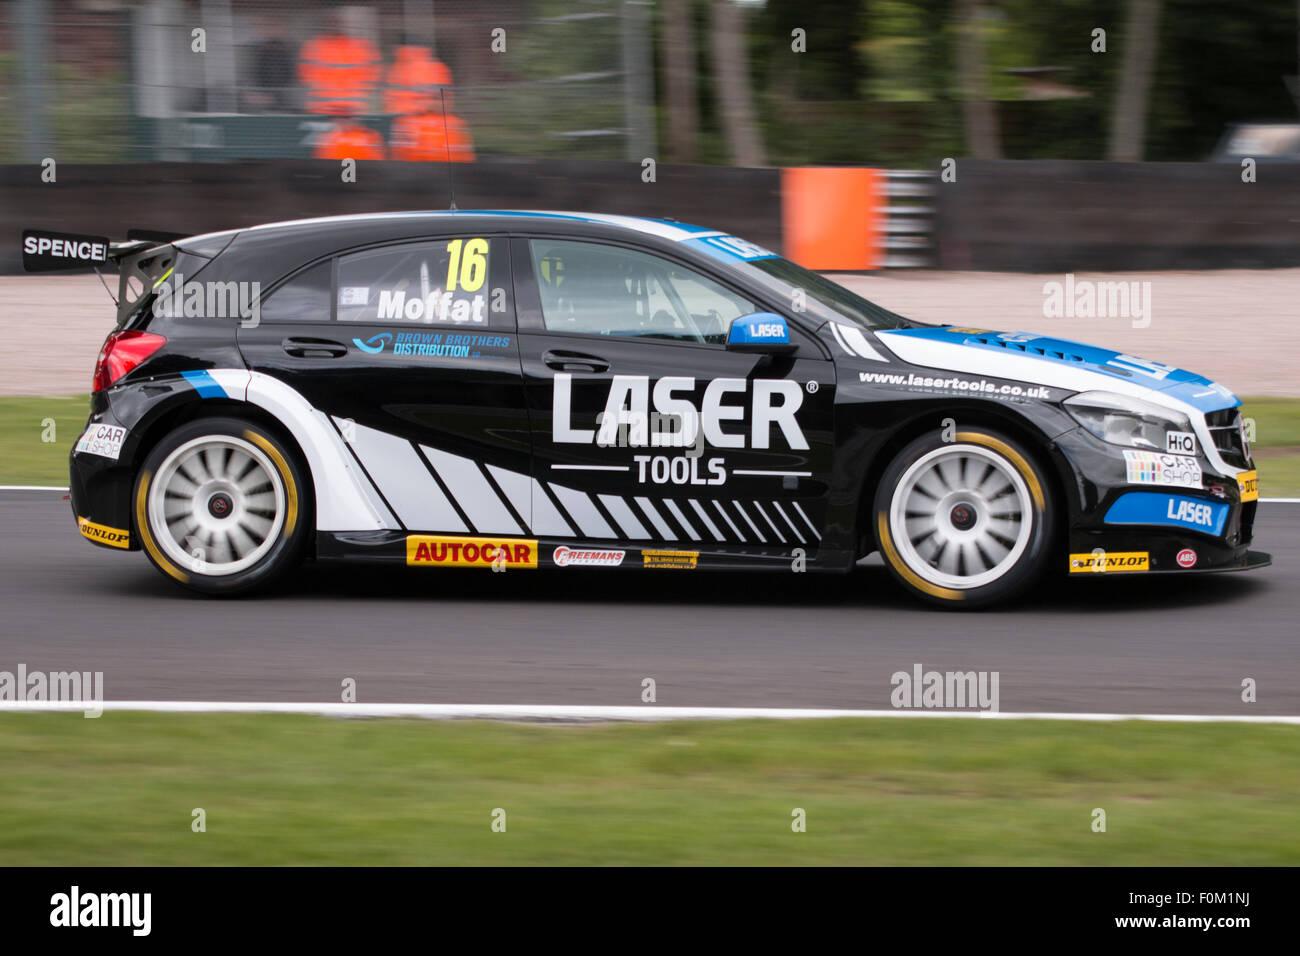 Aiden Moffat At Druids In Team Laser Tools Racing Mercedes ...